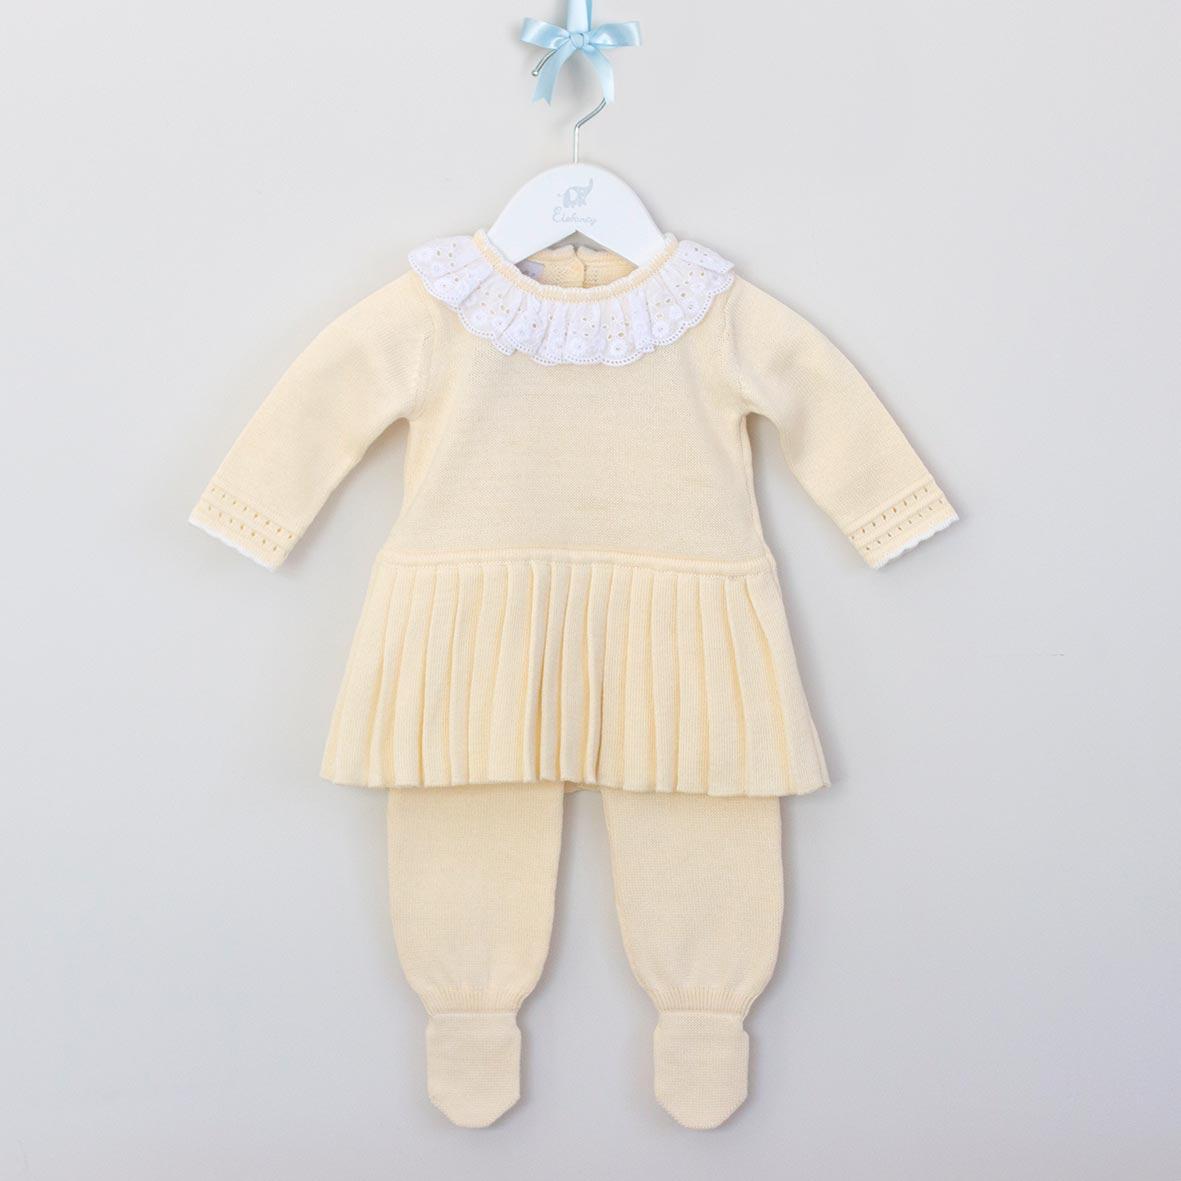 Saída Maternidade Vestido Renda Inglesa Amarelo  - Tricô